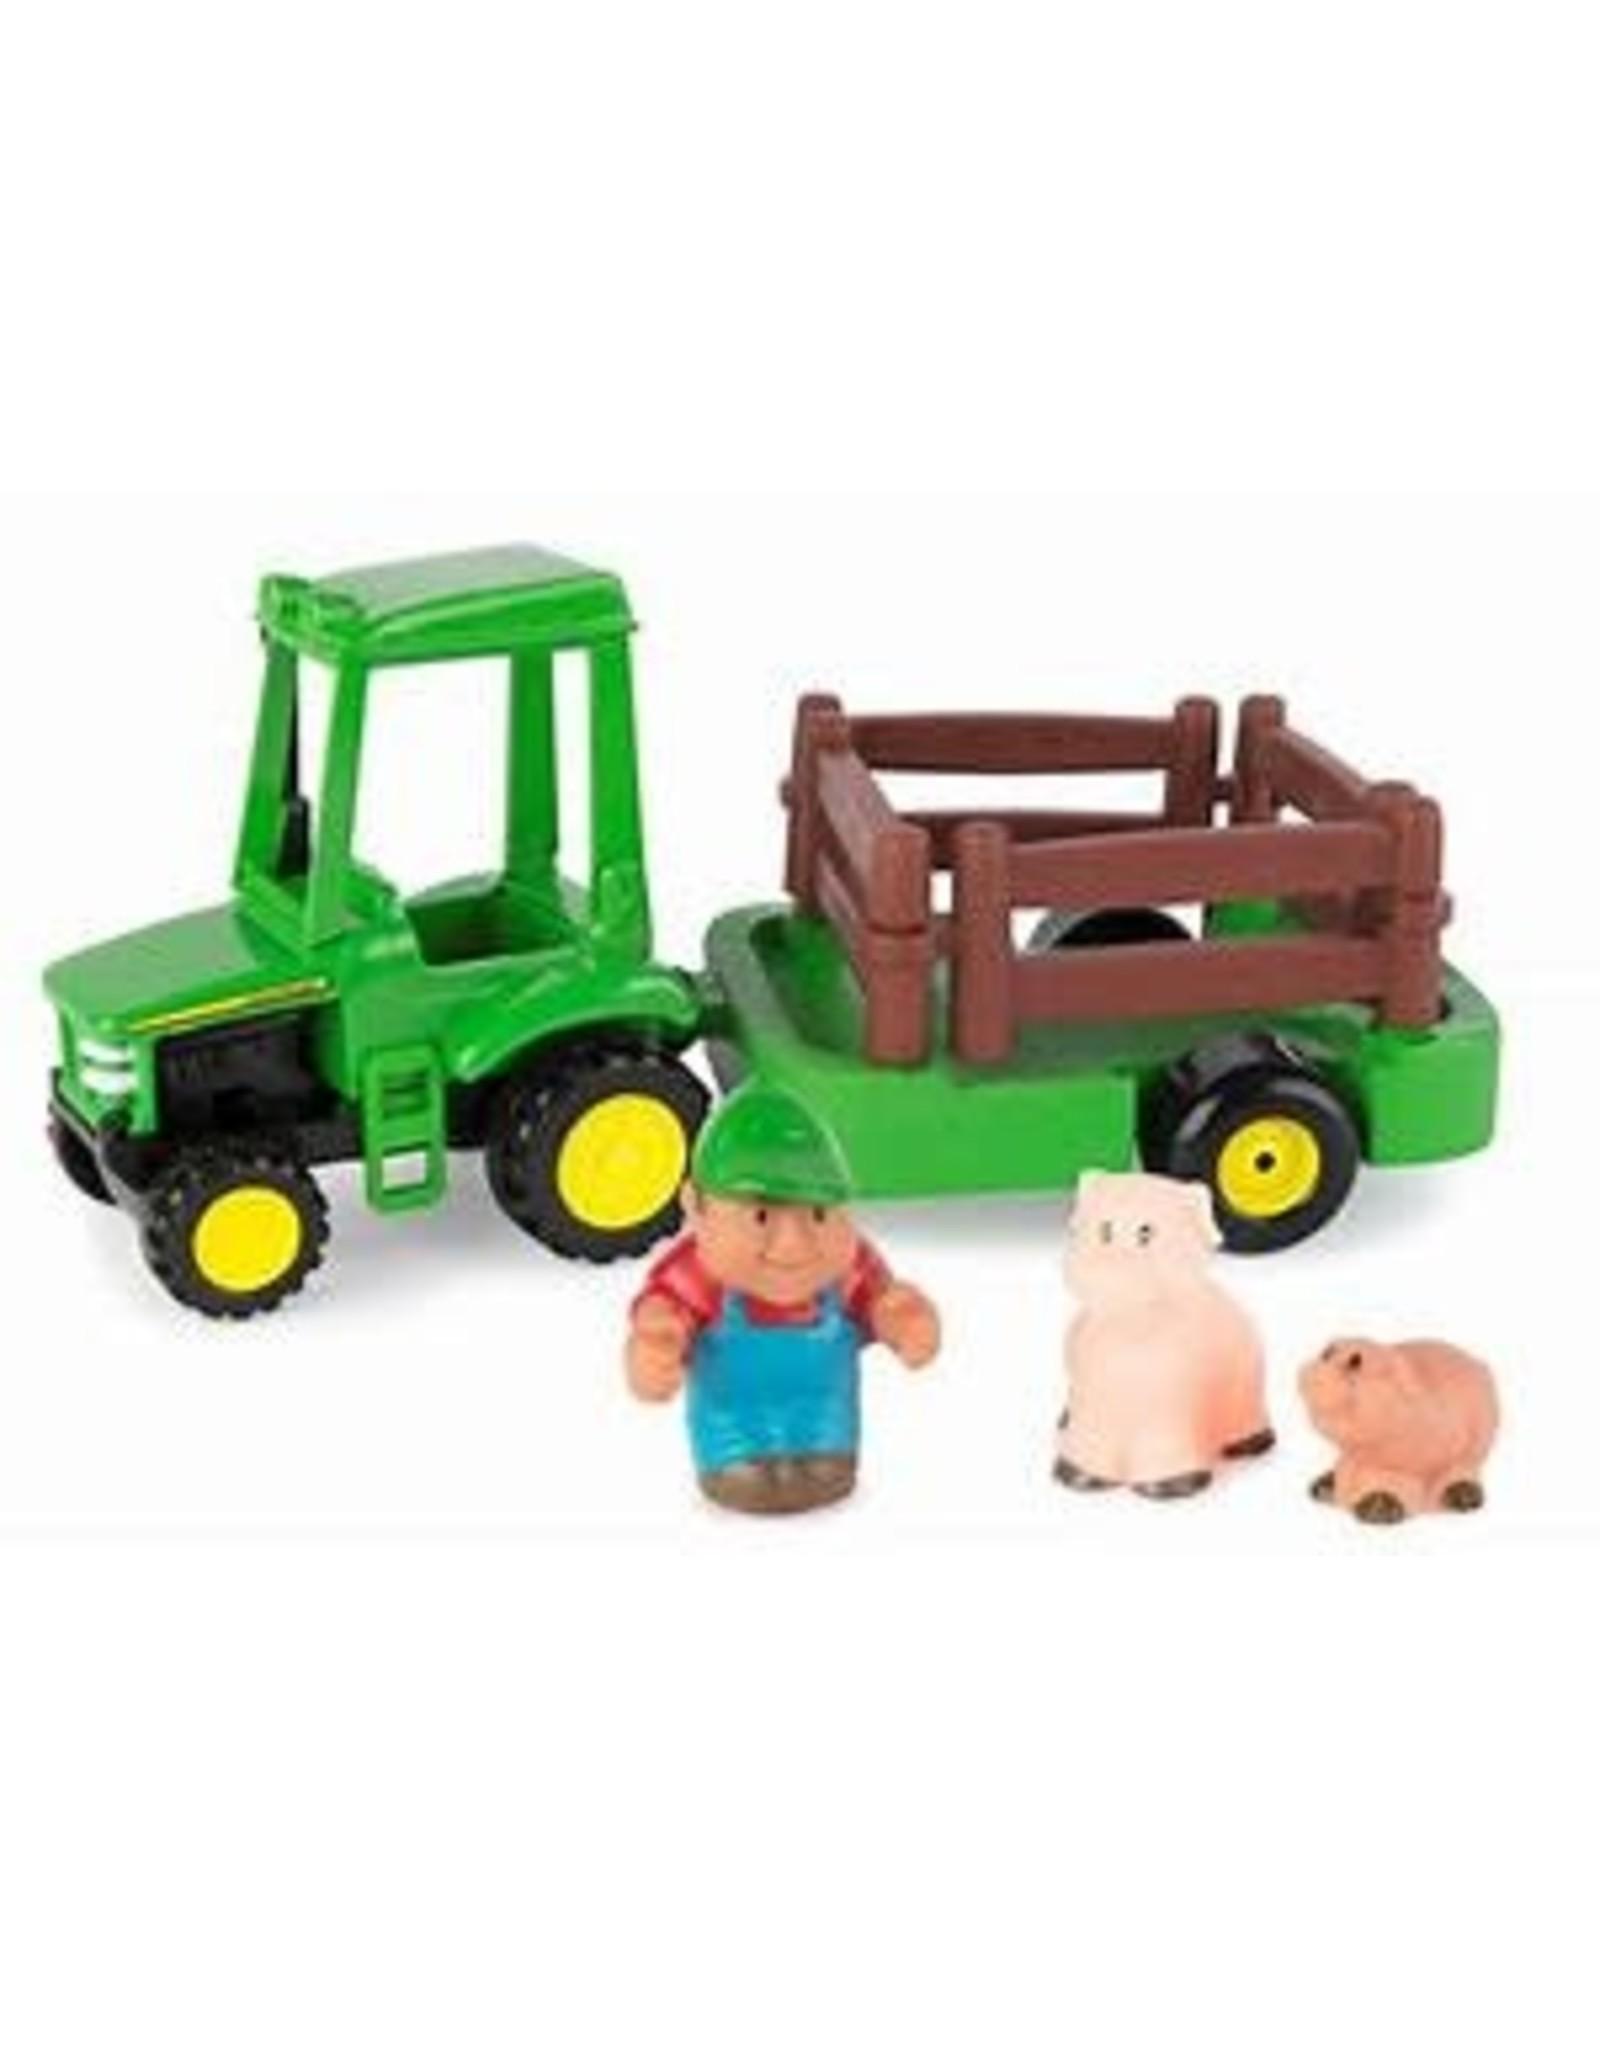 John Deere First Farming Fun Hauling Set